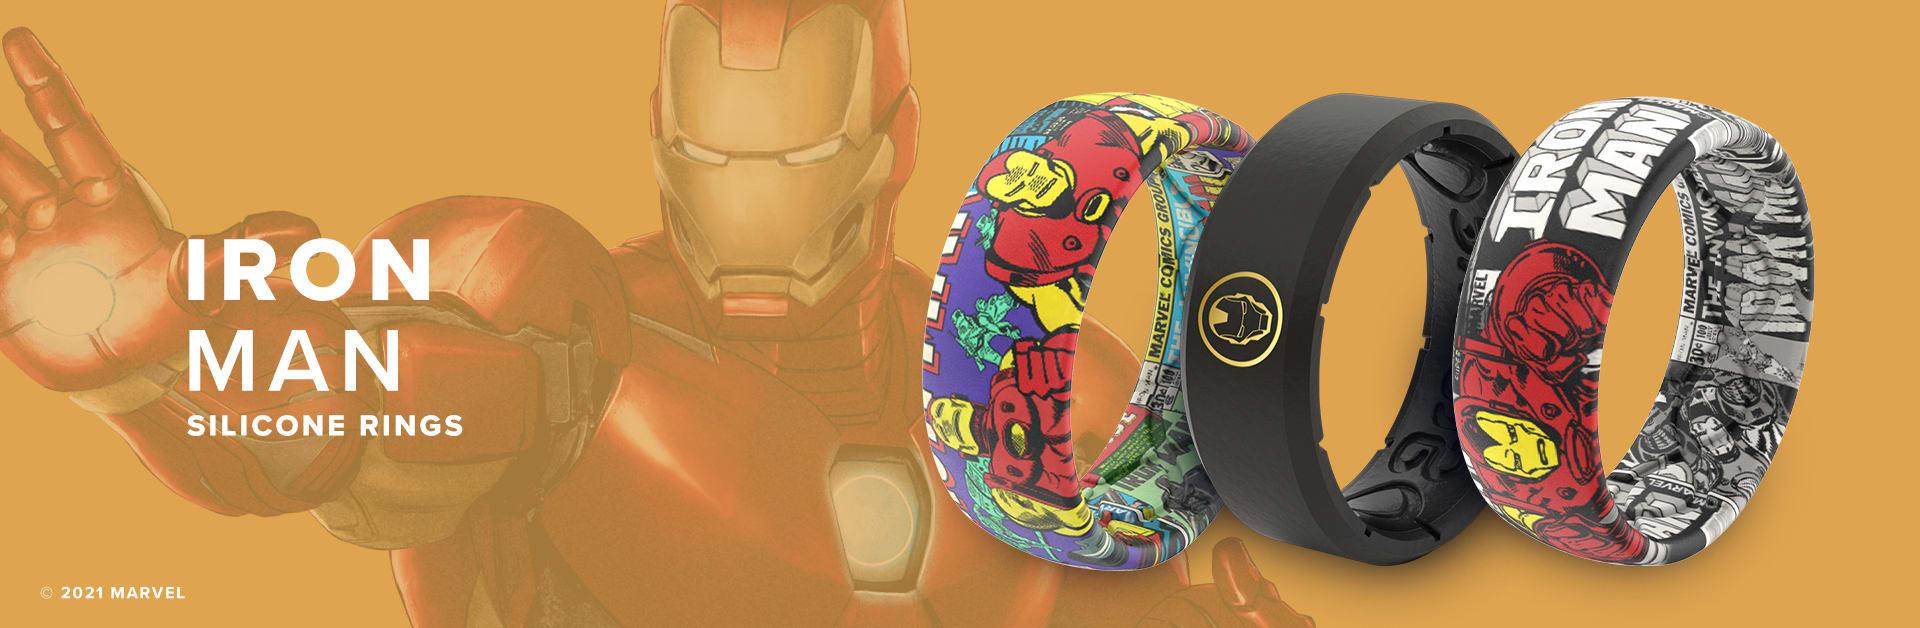 Iron Man Marvel Silicone Rings